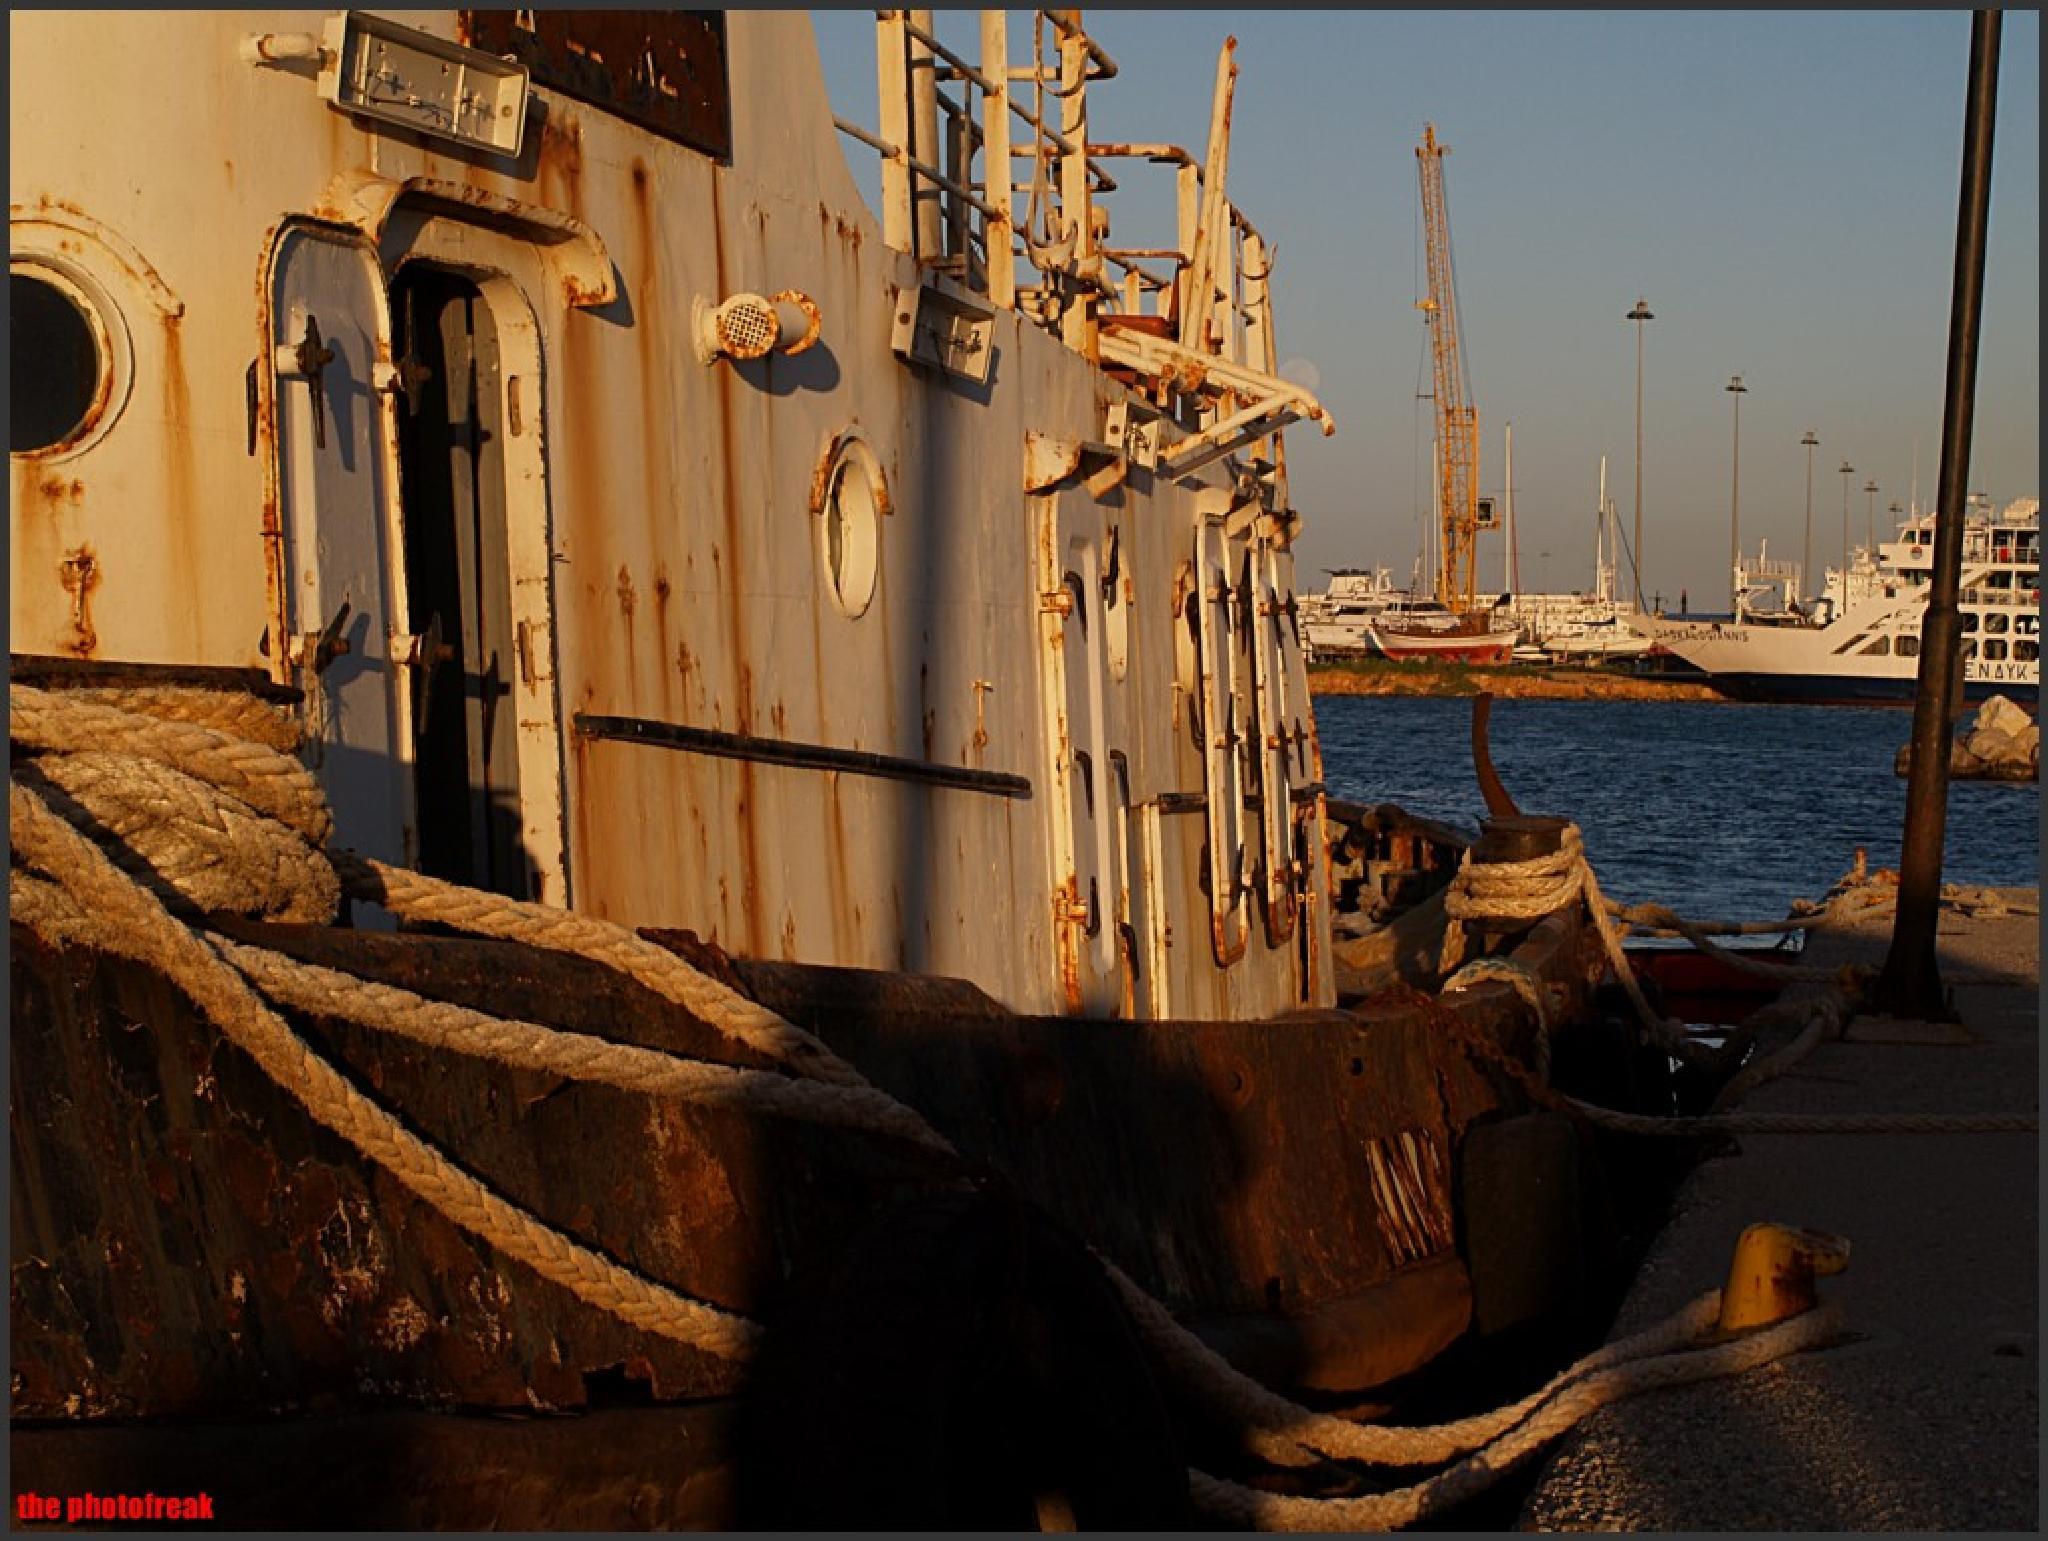 ships die in the harbors by harrythephotofreak